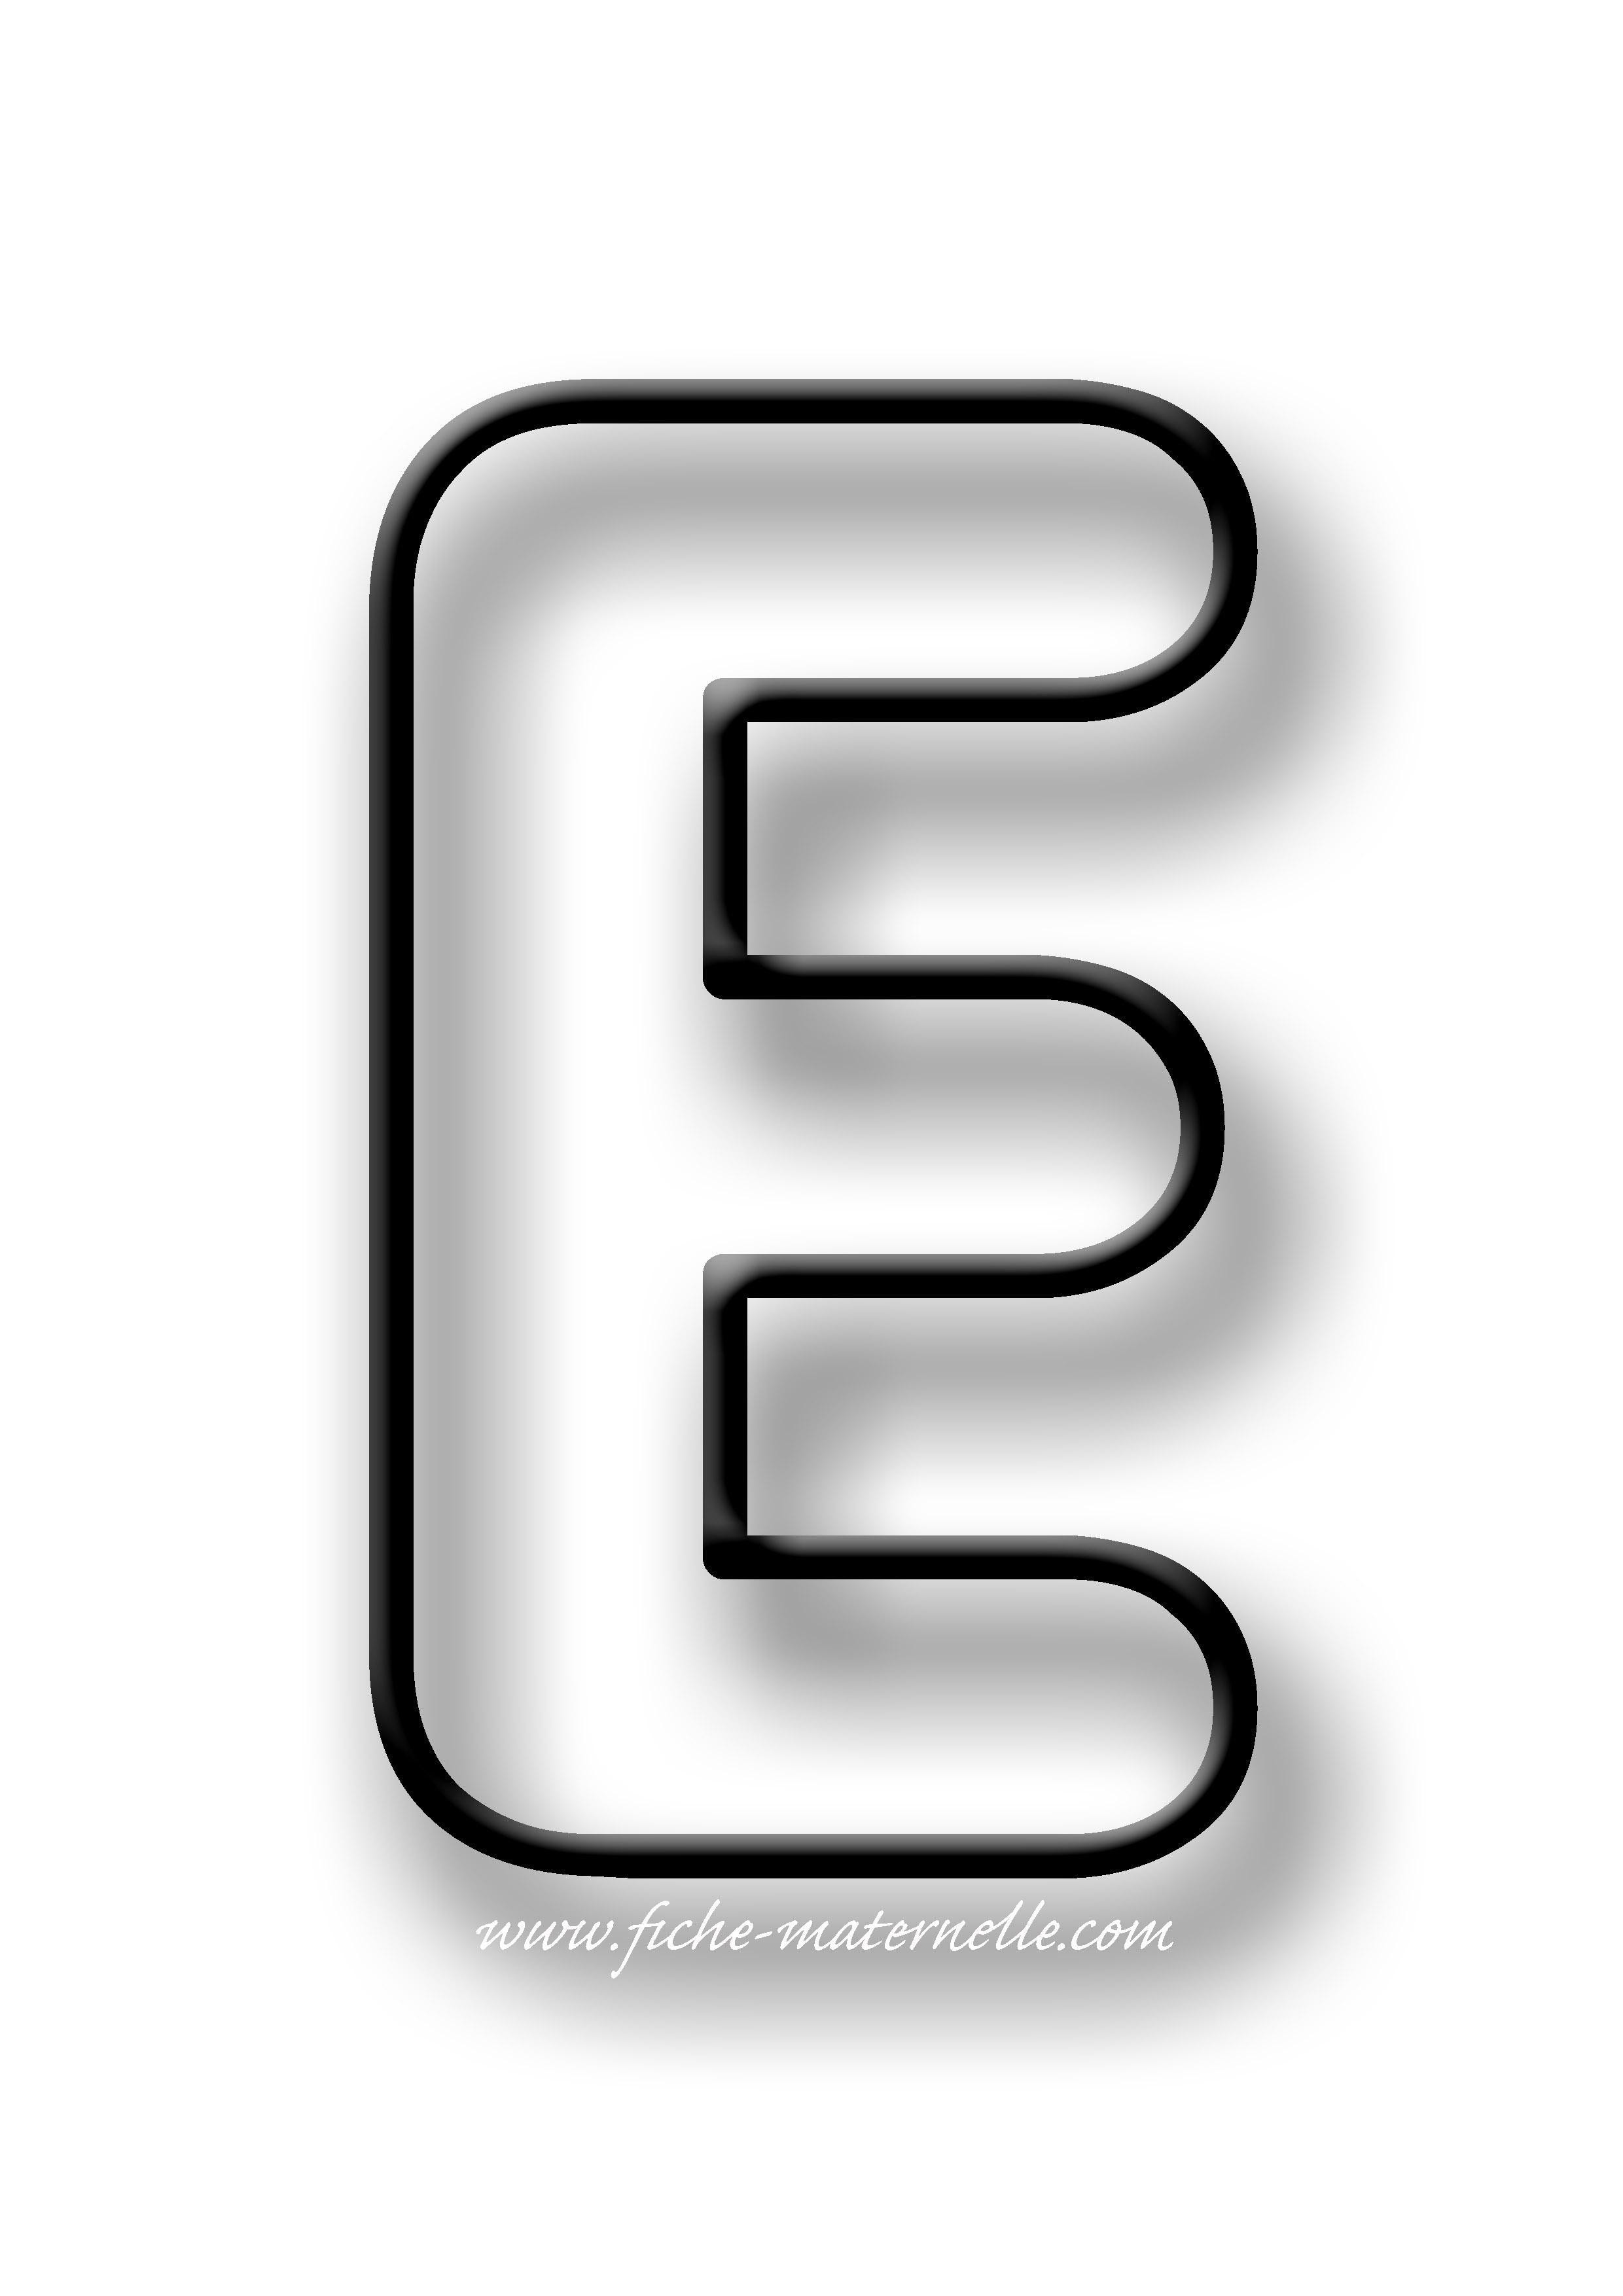 image de la lettre e